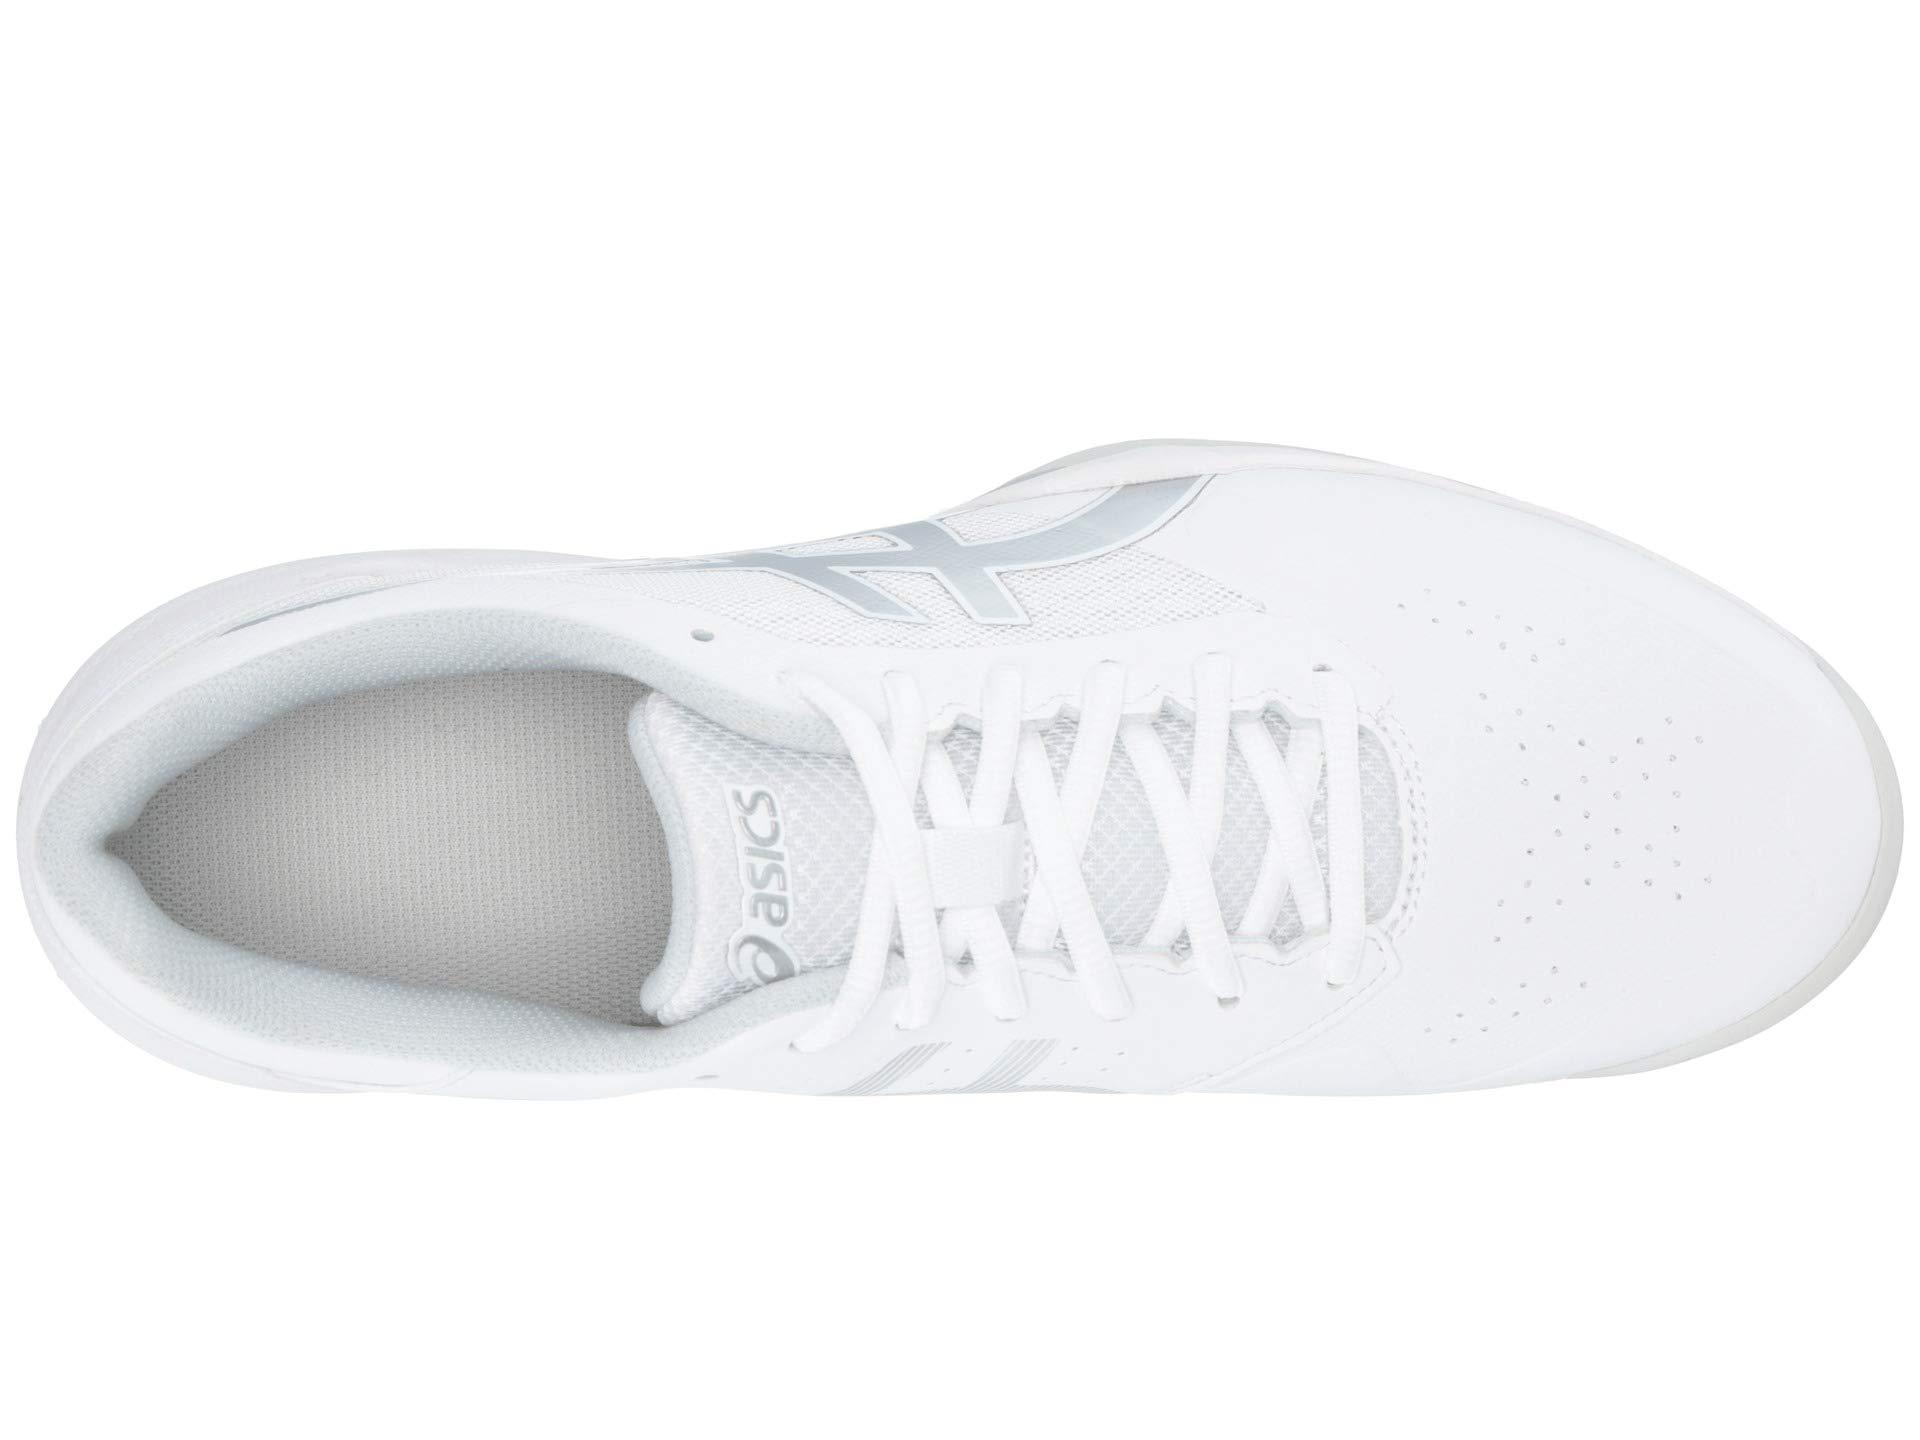 cheap for discount fcd21 9f46c ... (black cherry Tomato) Men s Tennis Shoes. View fullscreen